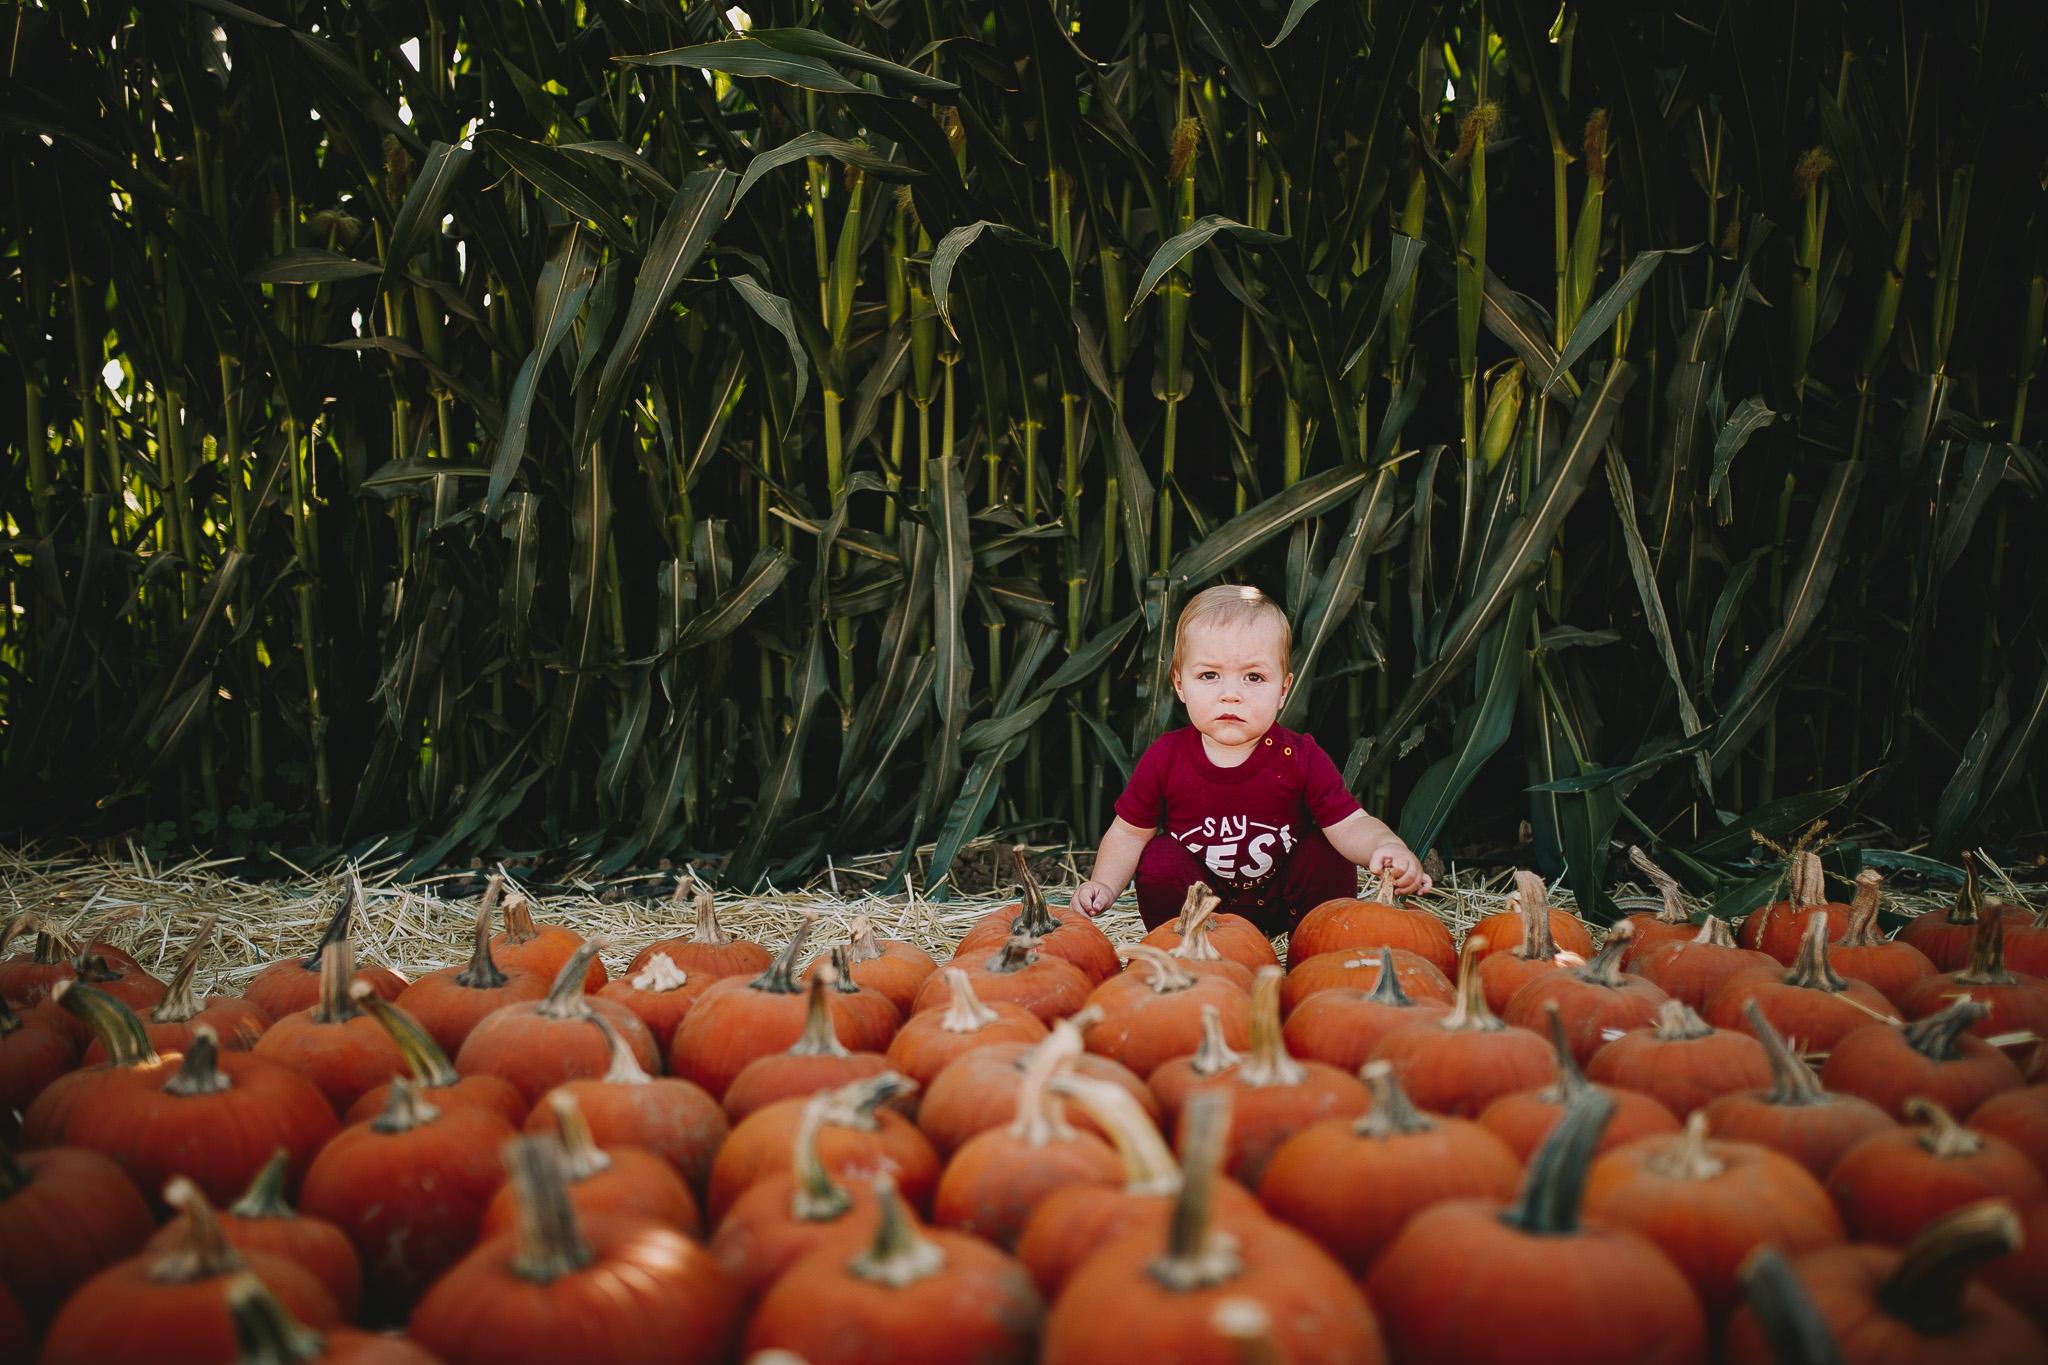 Archer_Inspired_Photography_Pumpkin_Patch_Morgan_Hill_Fall_Family_Photos-29.jpg